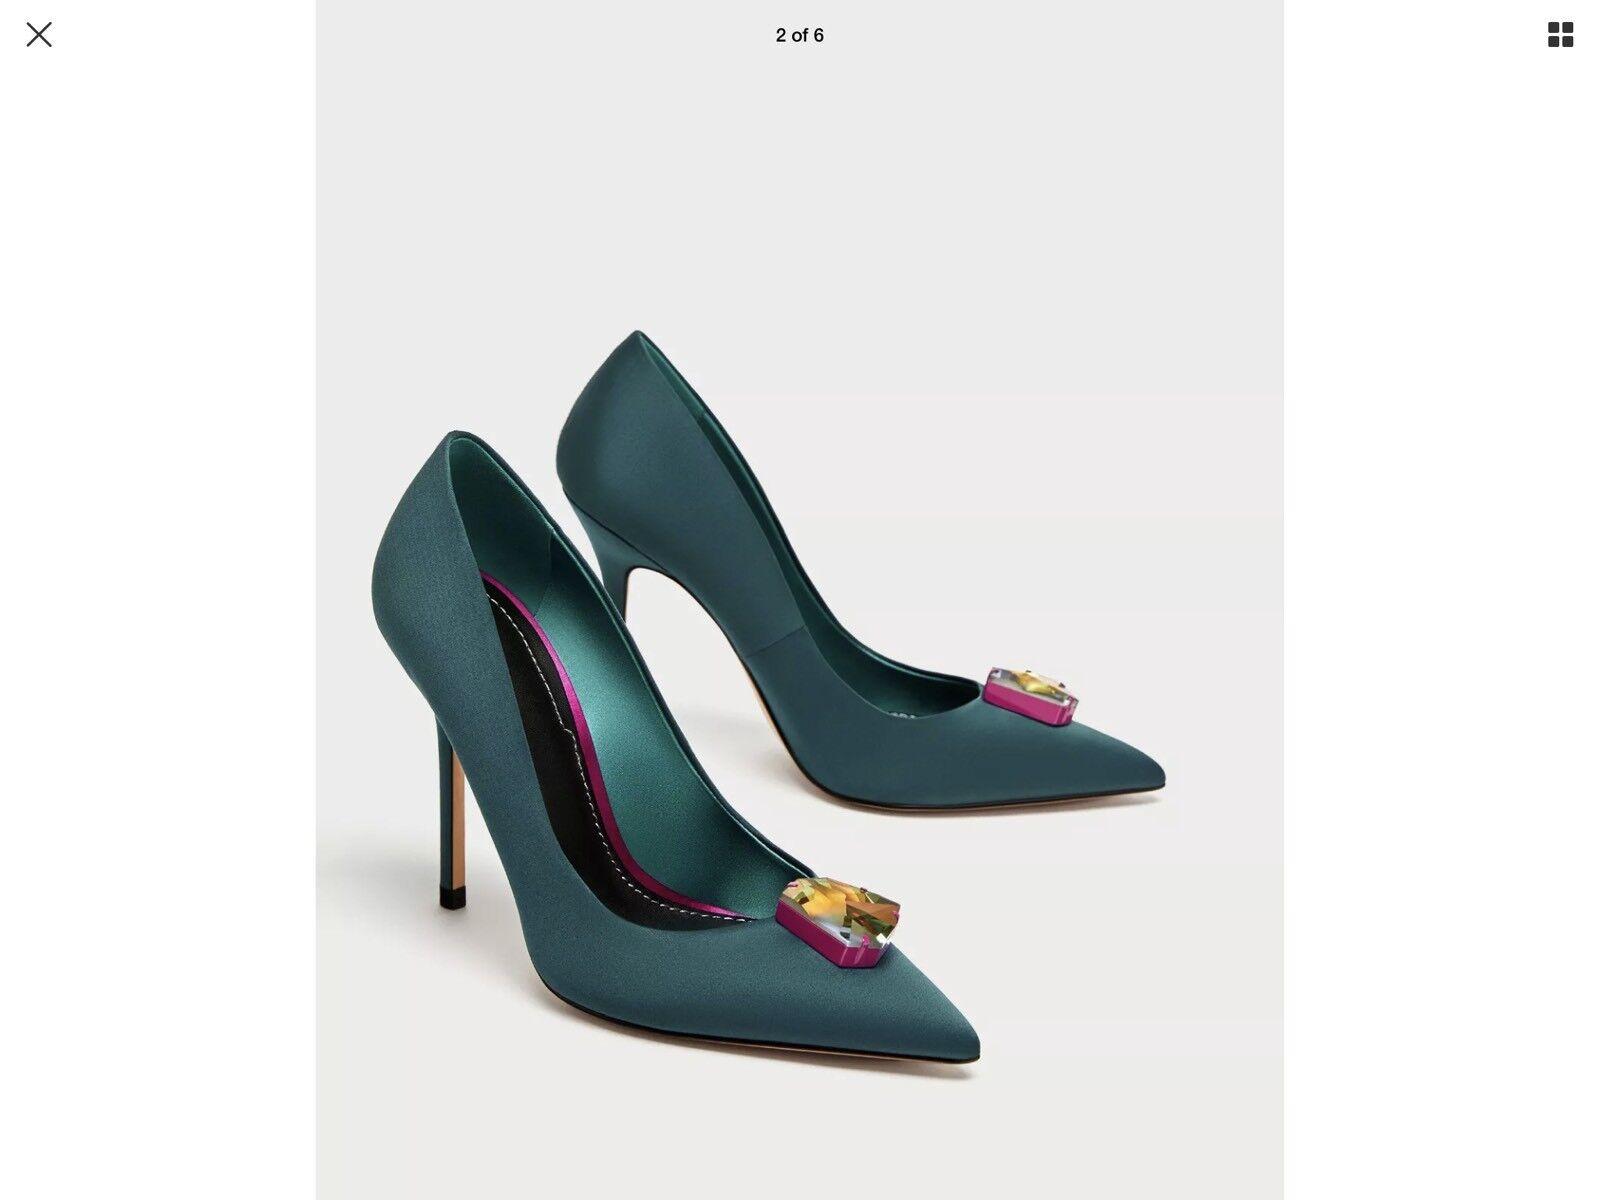 ZARA SATIN HIGH HEEL chaussures WITH SWAROVSKI CRYSTAL Sz 39 8.5